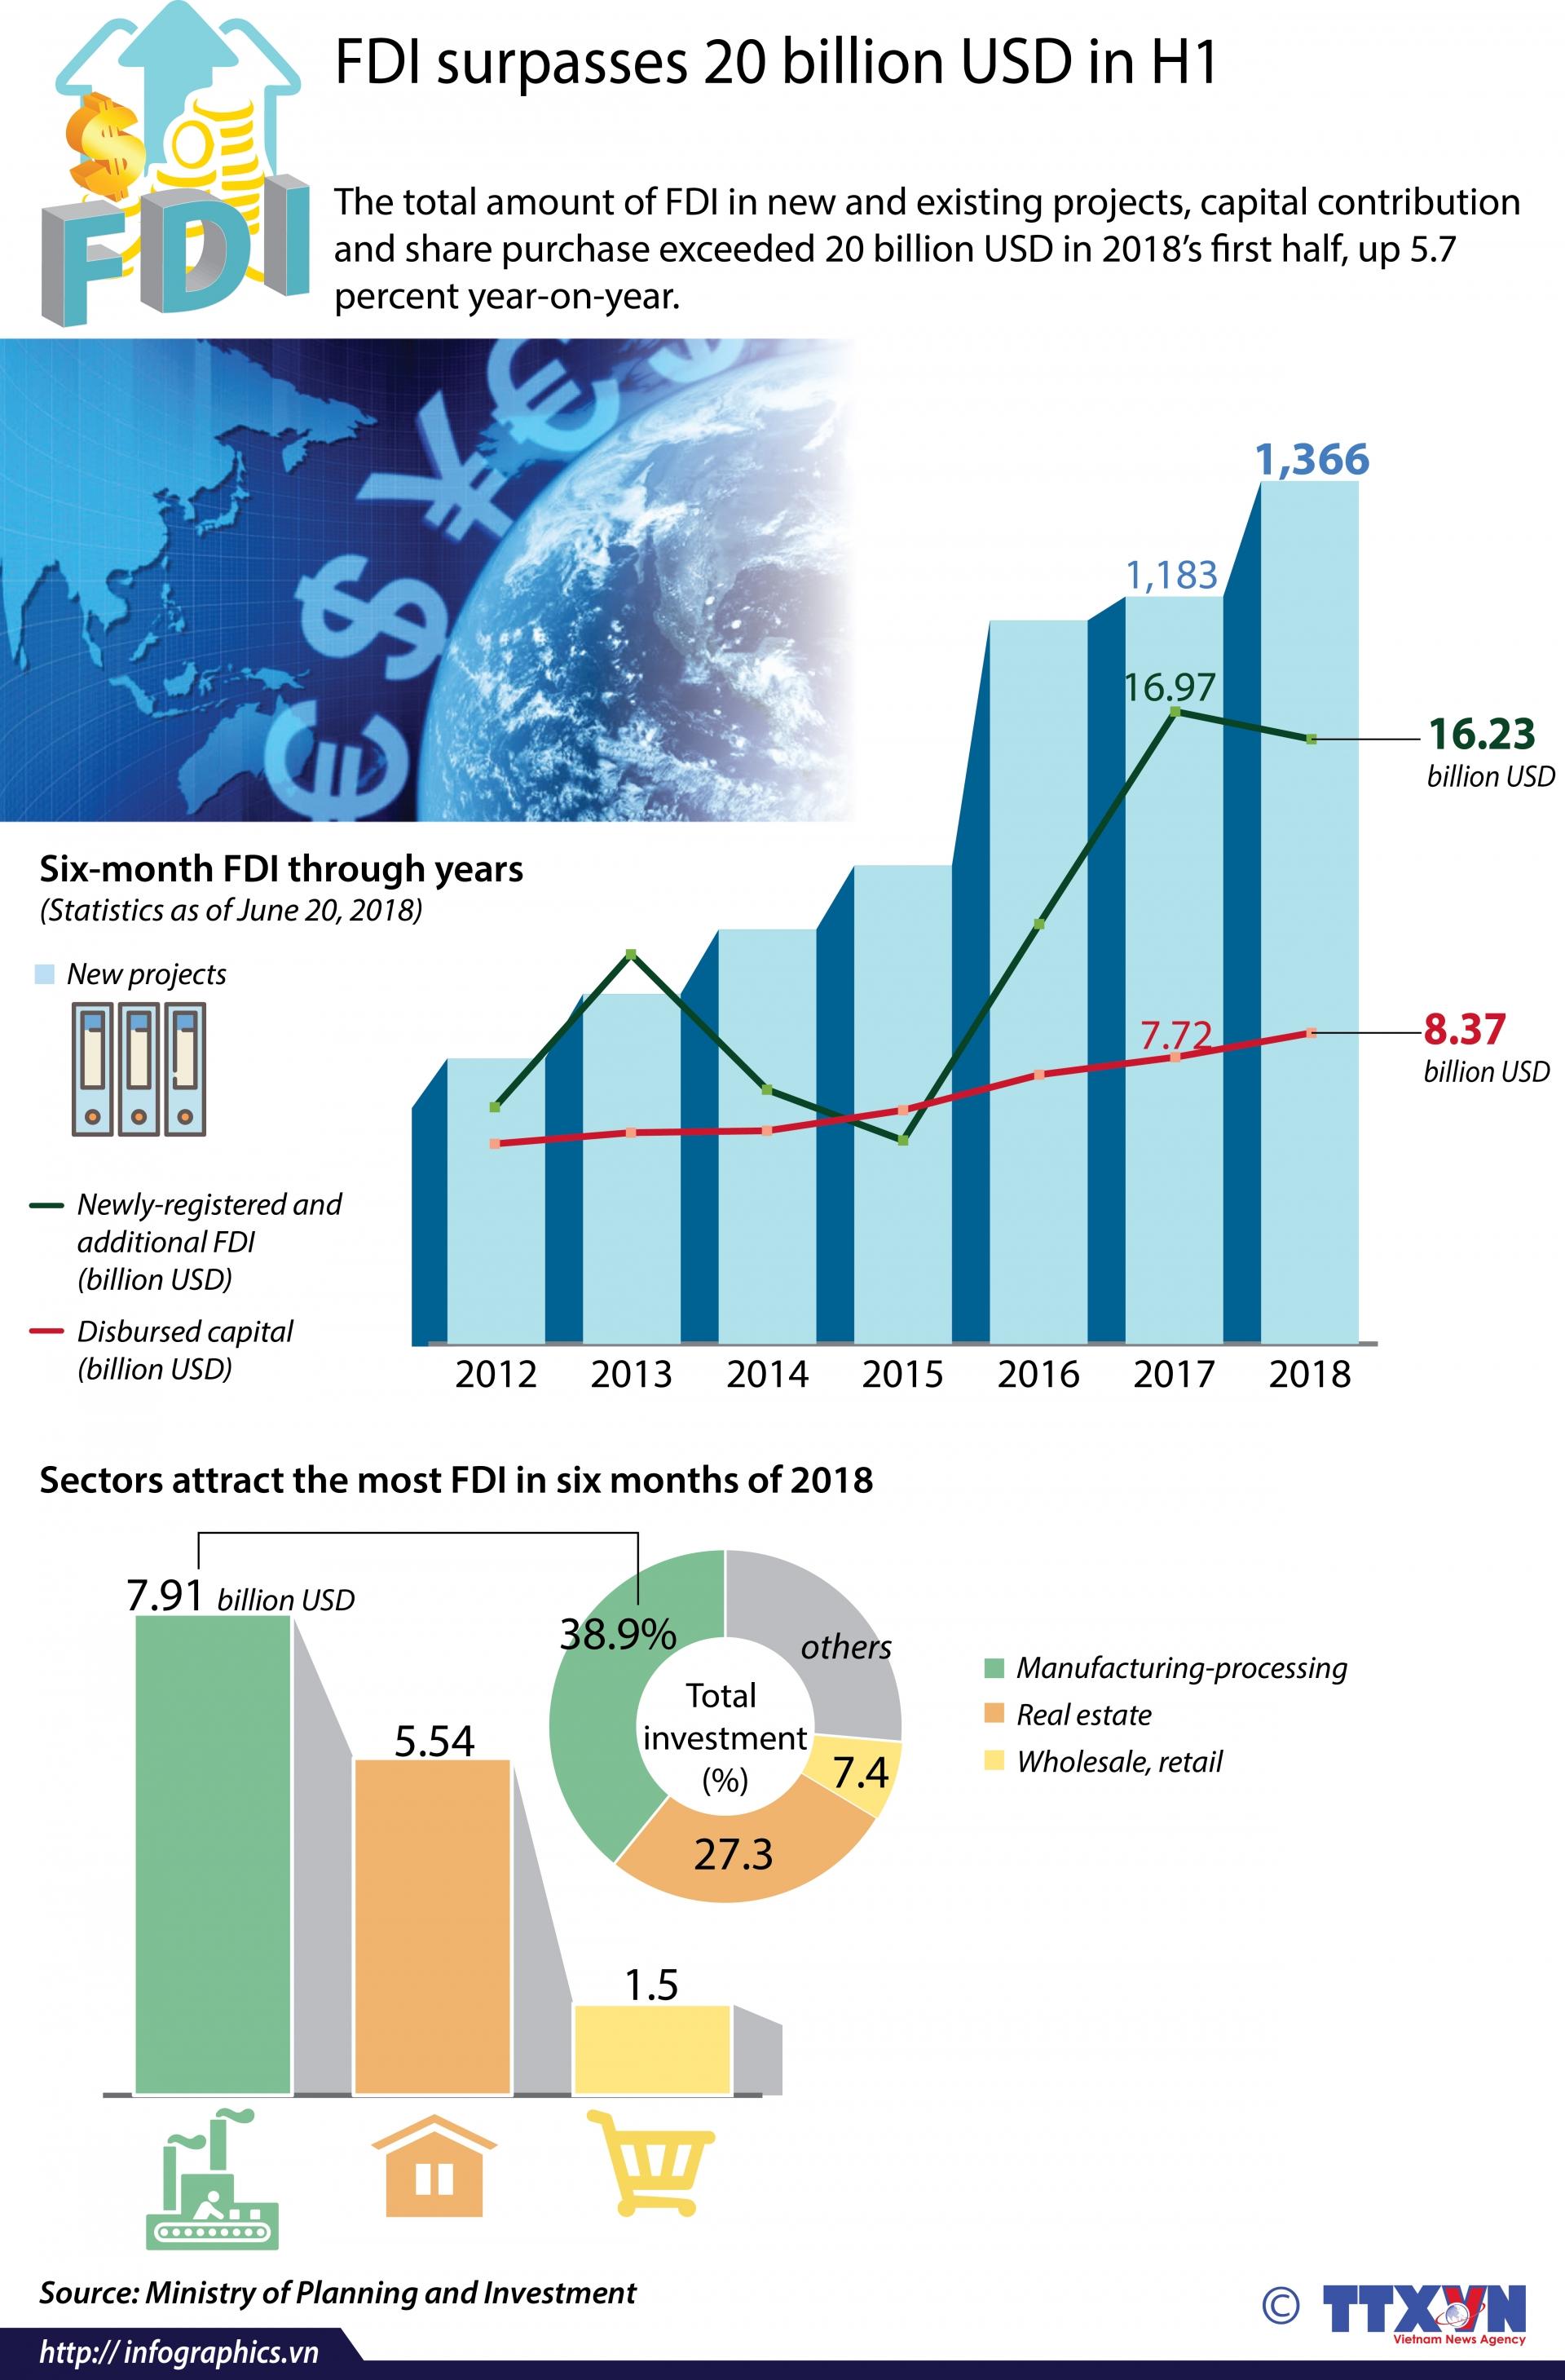 fdi surpasses 20 billion usd in h1